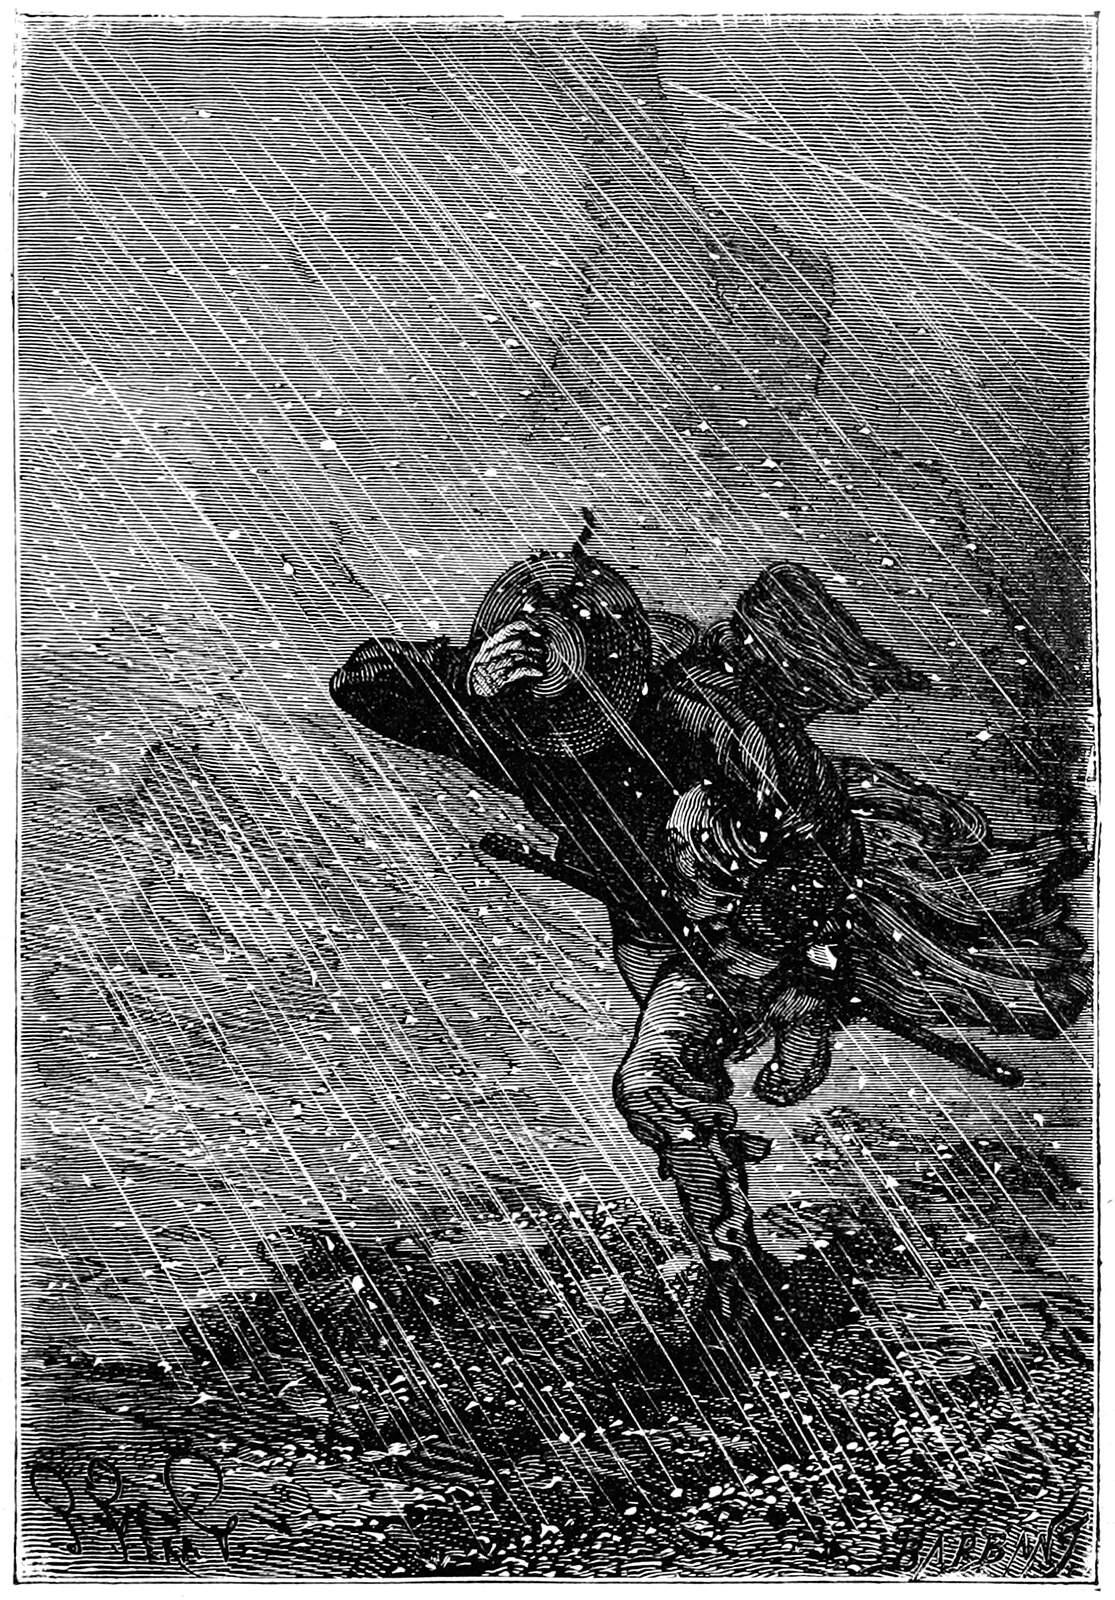 A person walks into a storm